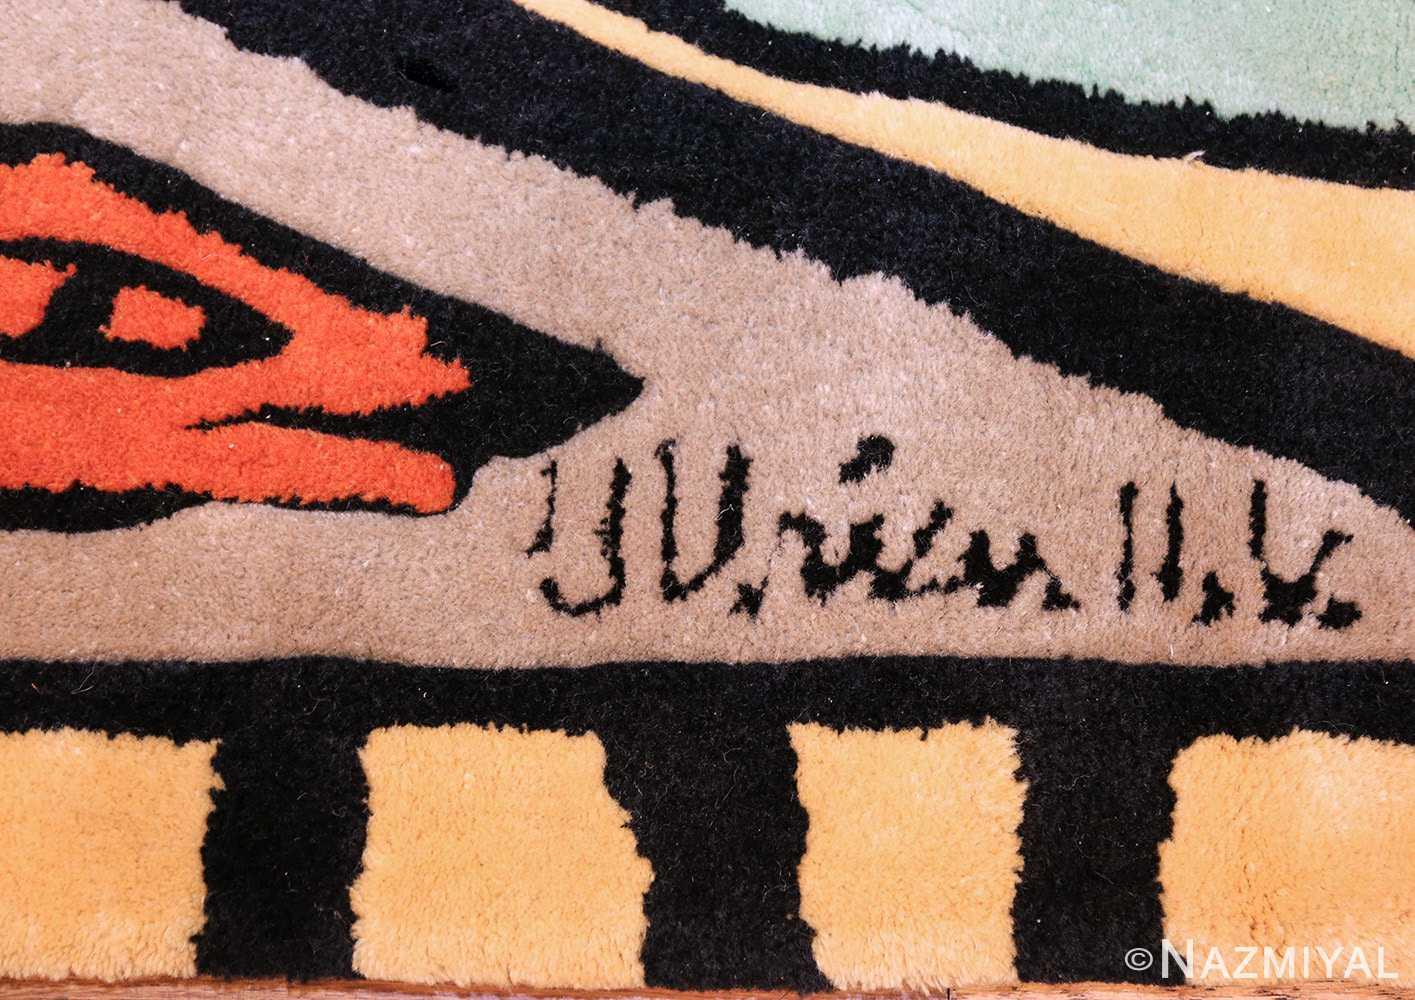 scandinavian rug after ulrica hydman vallien 48281 signature Nazmiyal